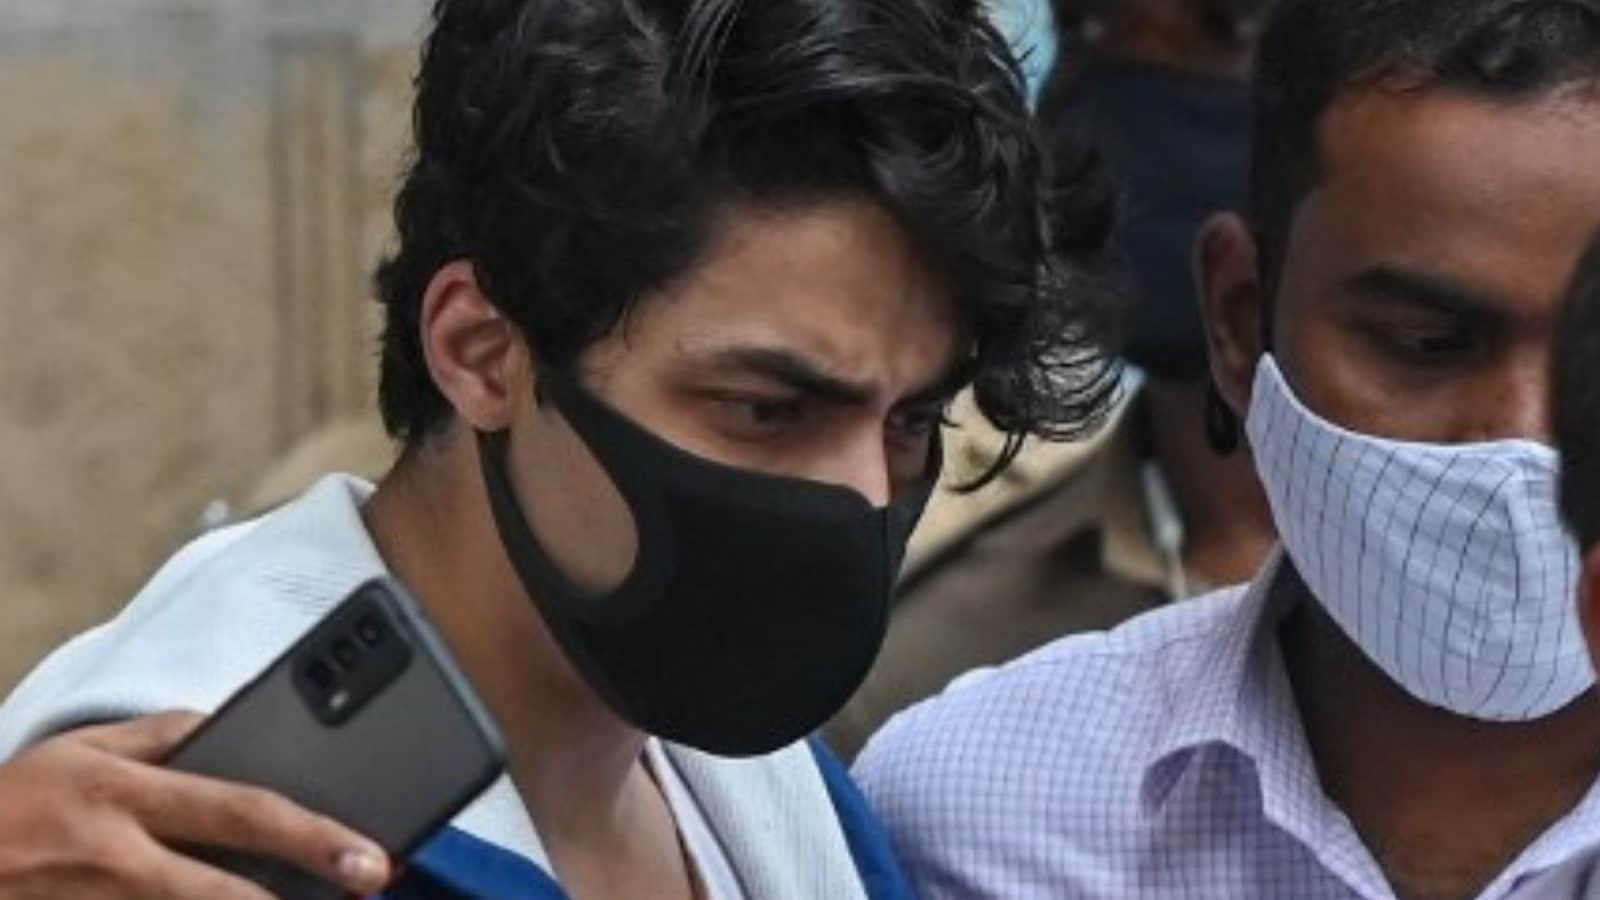 आर्यन खान को नहीं मिली ज़मानत, कब पूरी होगी मन्नत